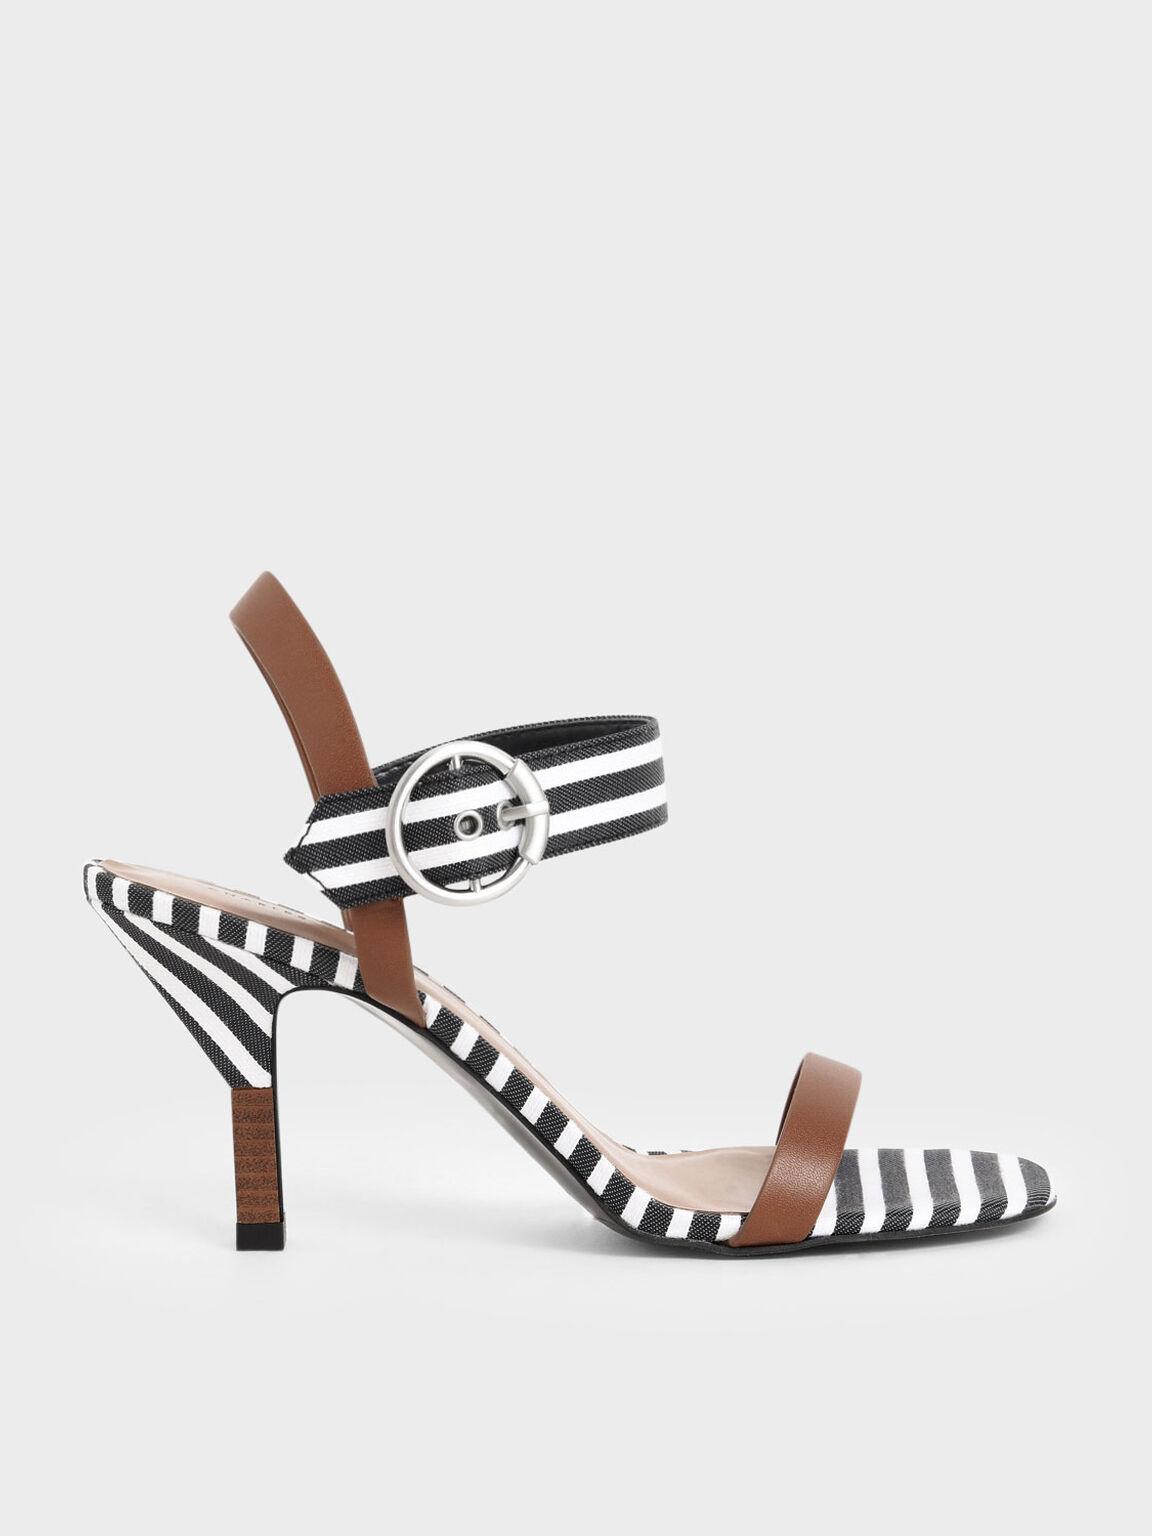 Oversized Buckle Striped Heeled Sandals, Dark Blue, hi-res